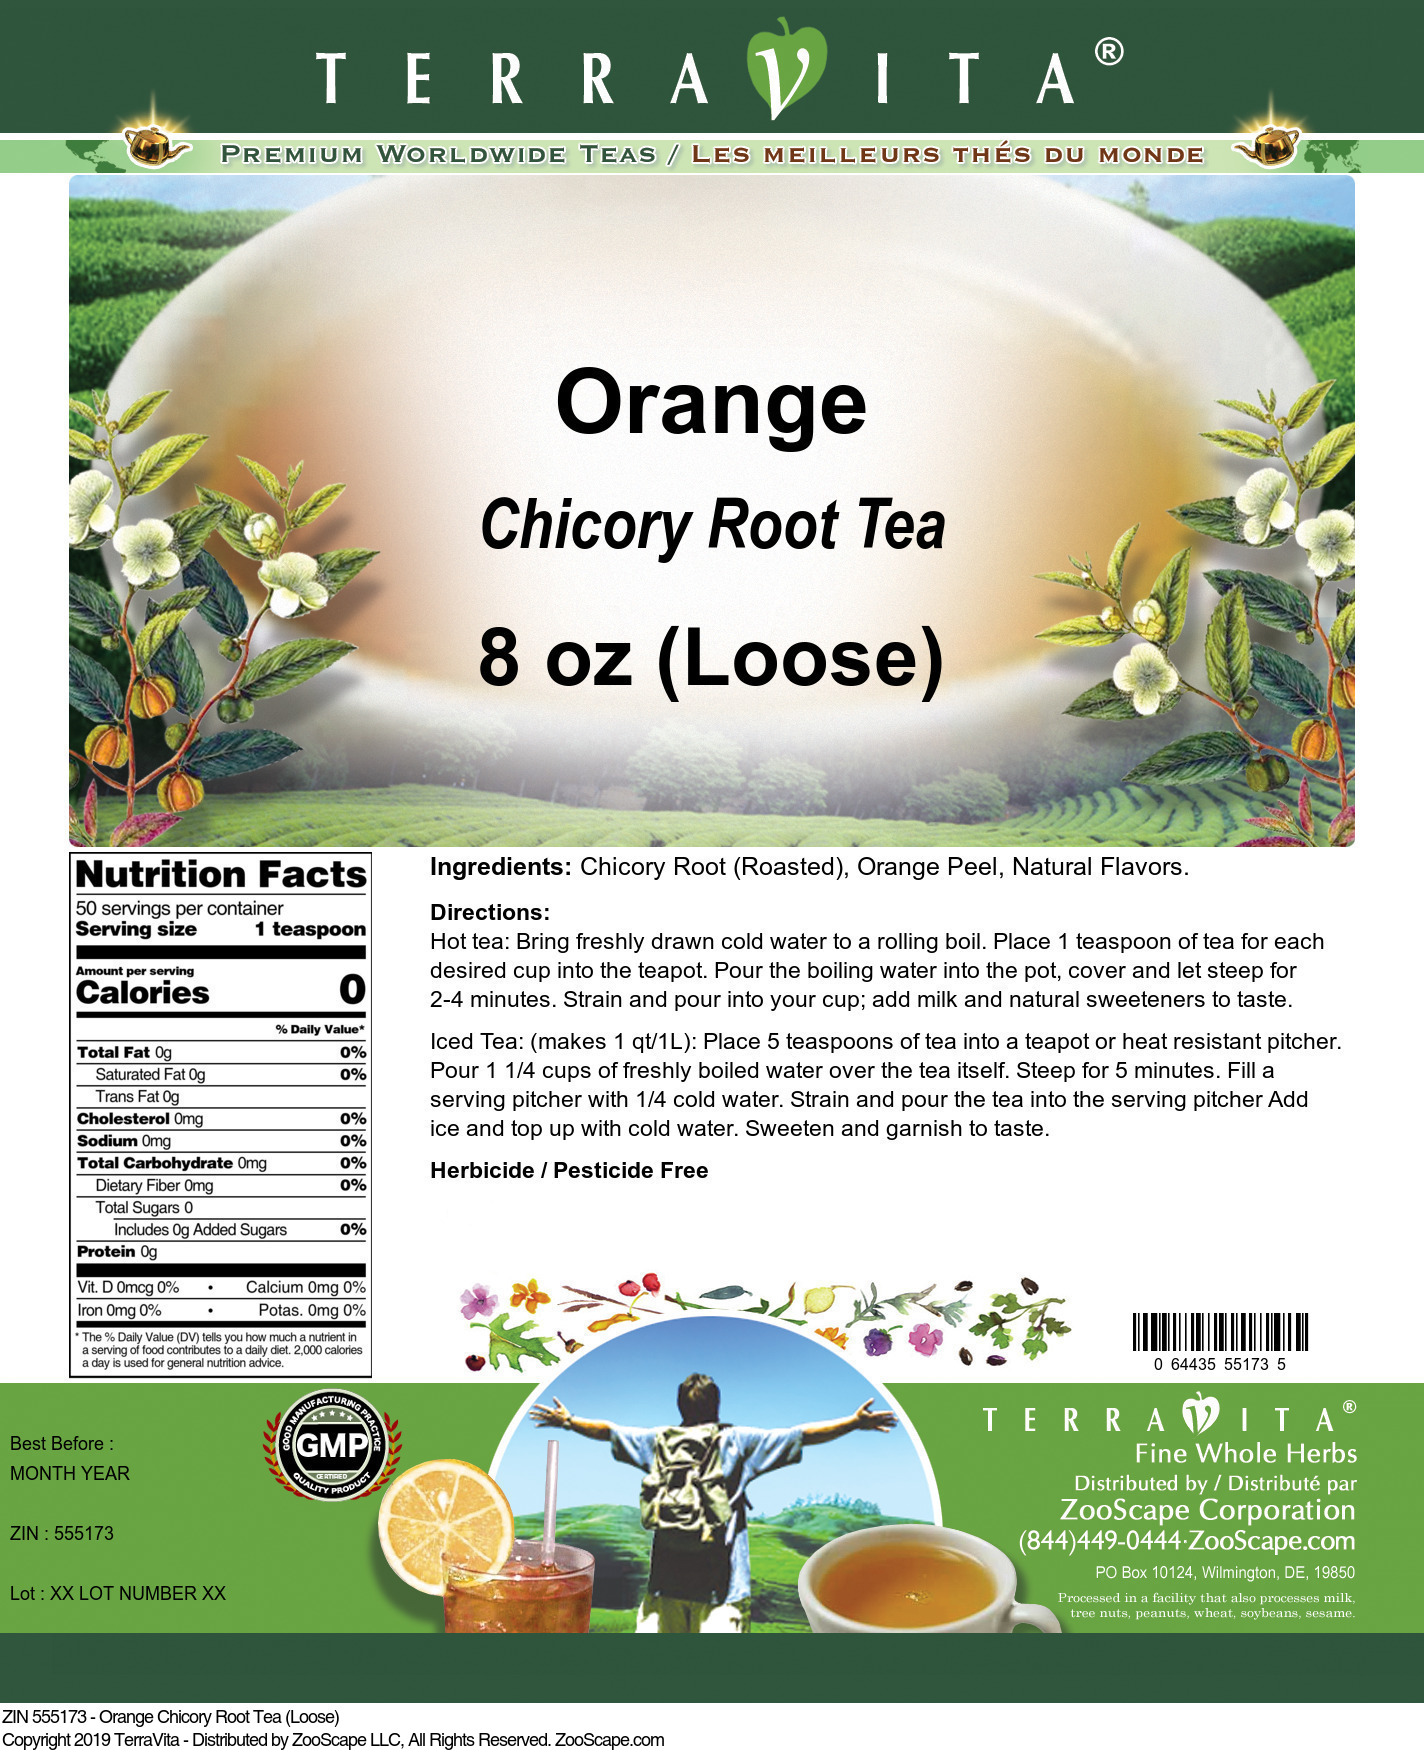 Orange Chicory Root Tea (Loose)